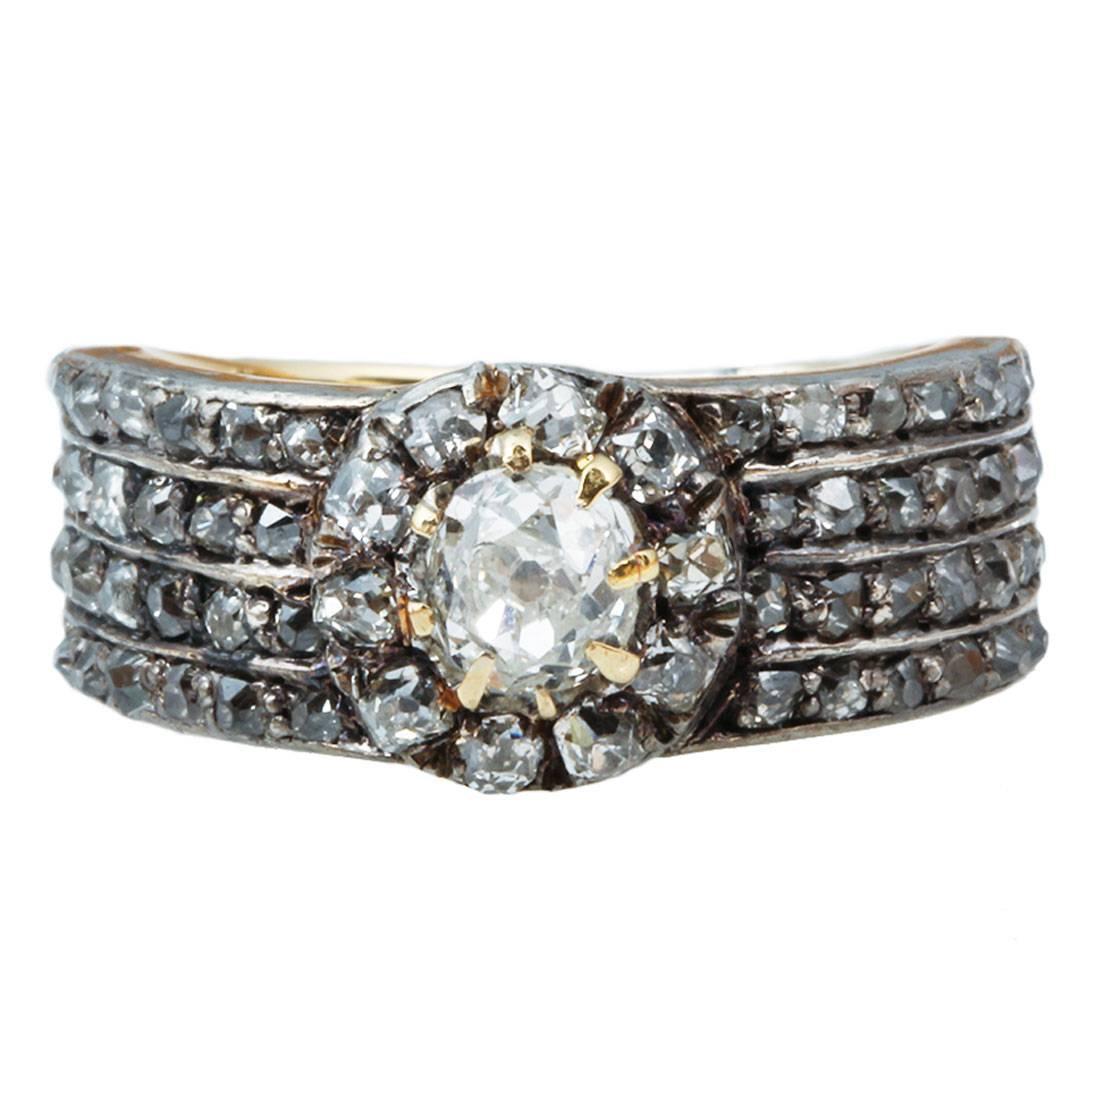 Victorian Diamond Ring At 1stdibs. 5 Stone Rings. Astrology Wedding Rings. Stud Rings. Five Stone Engagement Rings. Regular Wedding Rings. Shorts Rings. Natural Peridot Wedding Rings. Anodised Titanium Wedding Rings